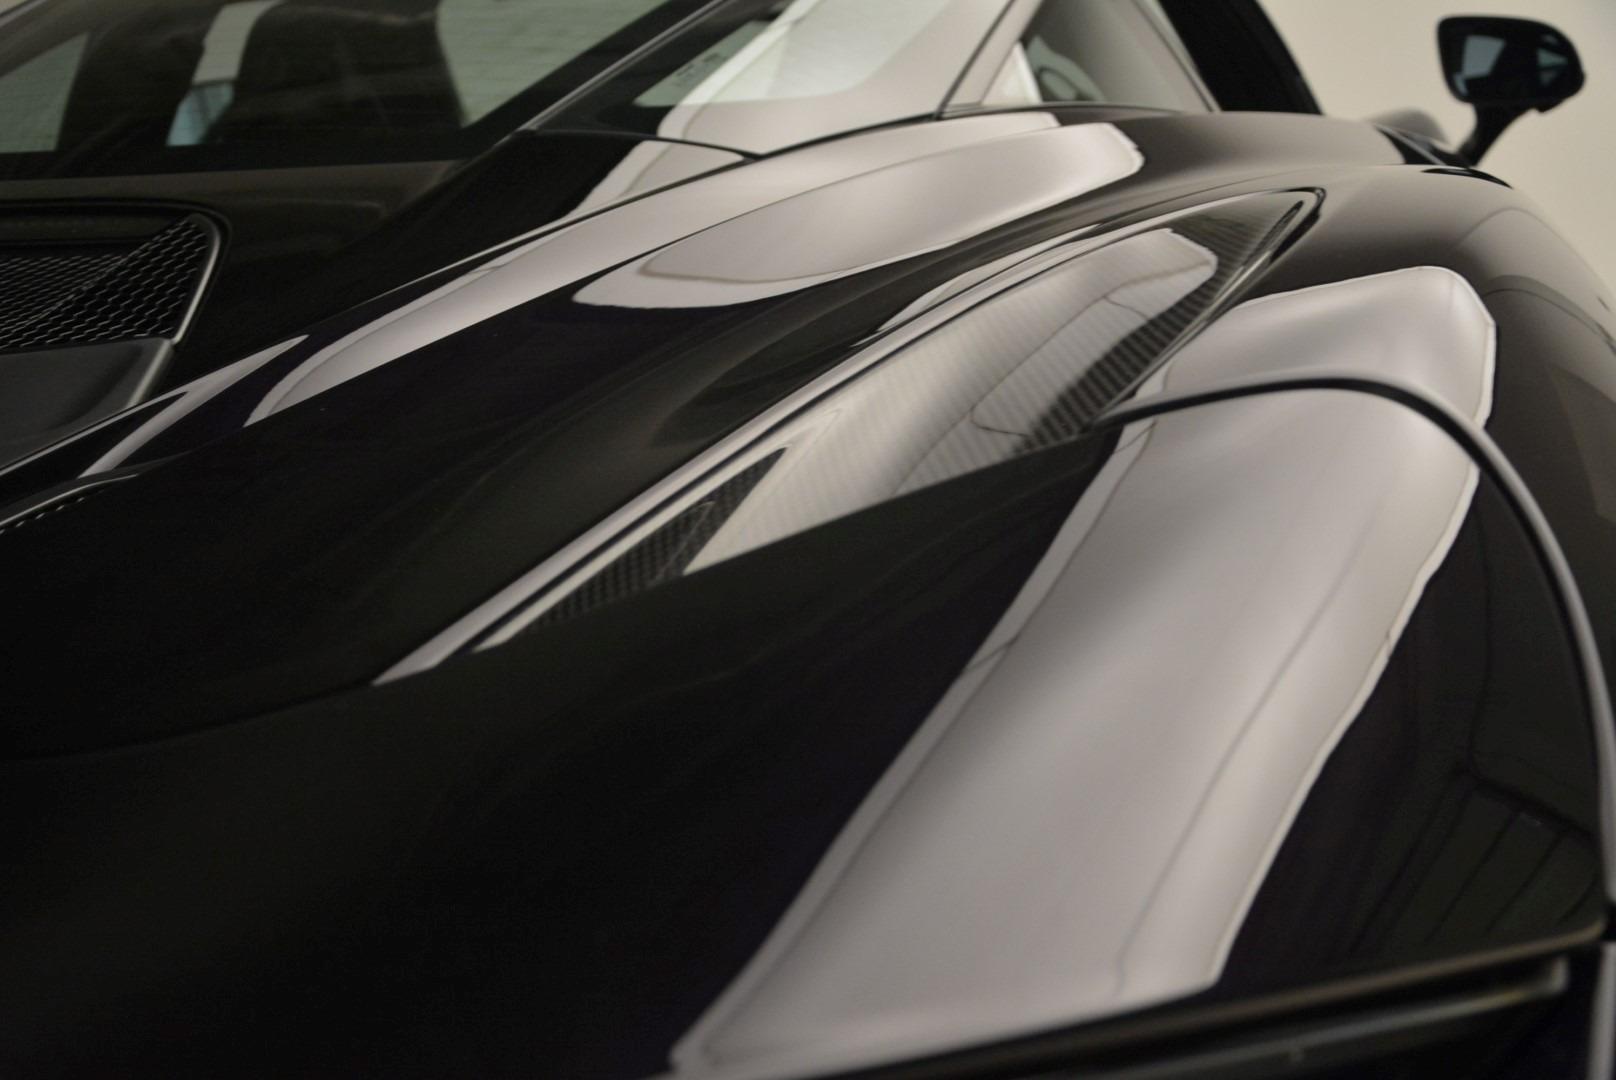 Used 2018 McLaren 720S Coupe For Sale In Westport, CT 2474_p22